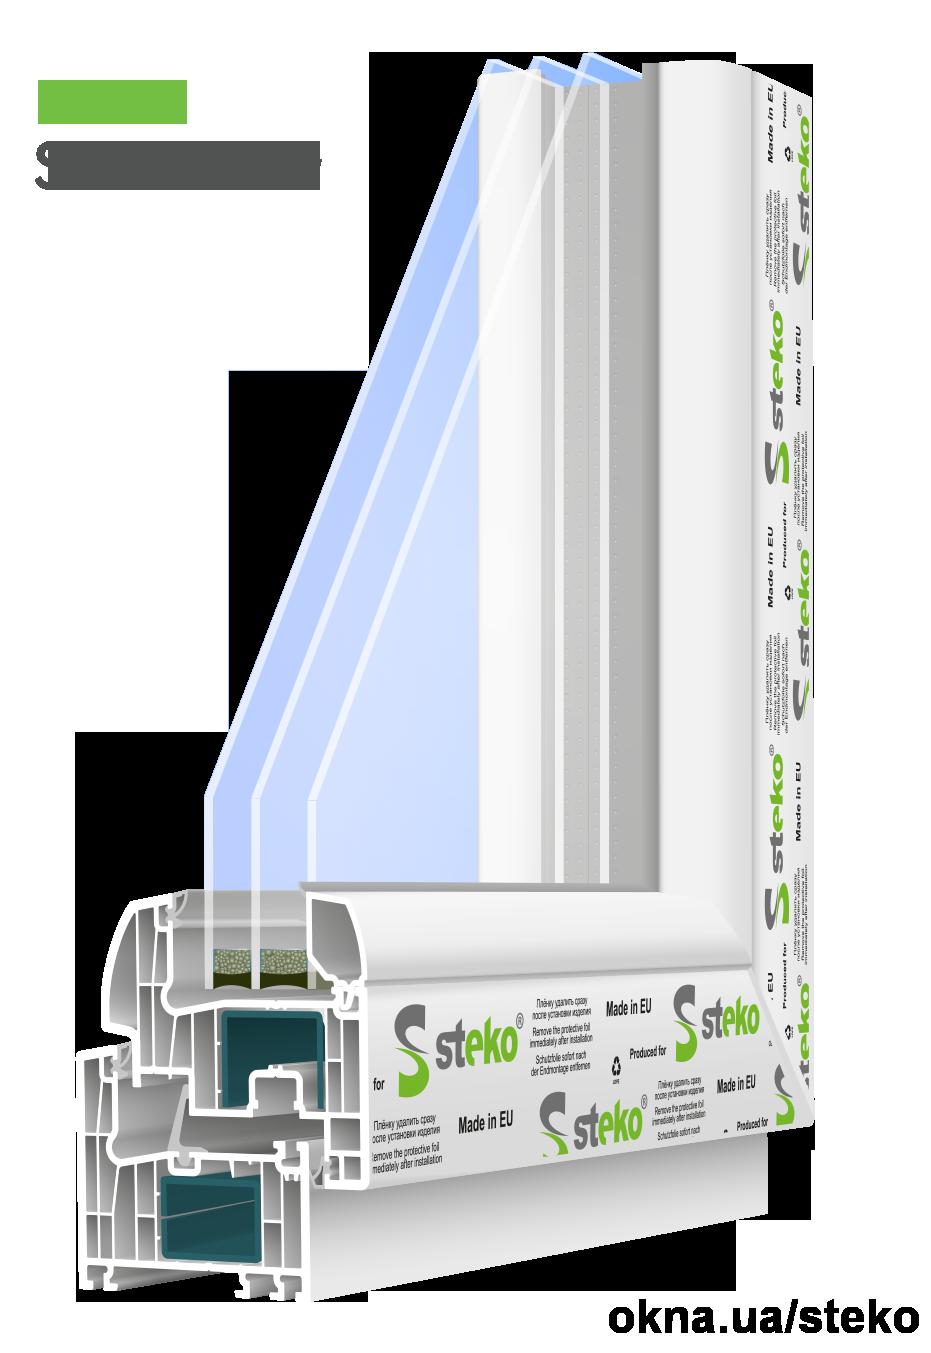 Steko R700